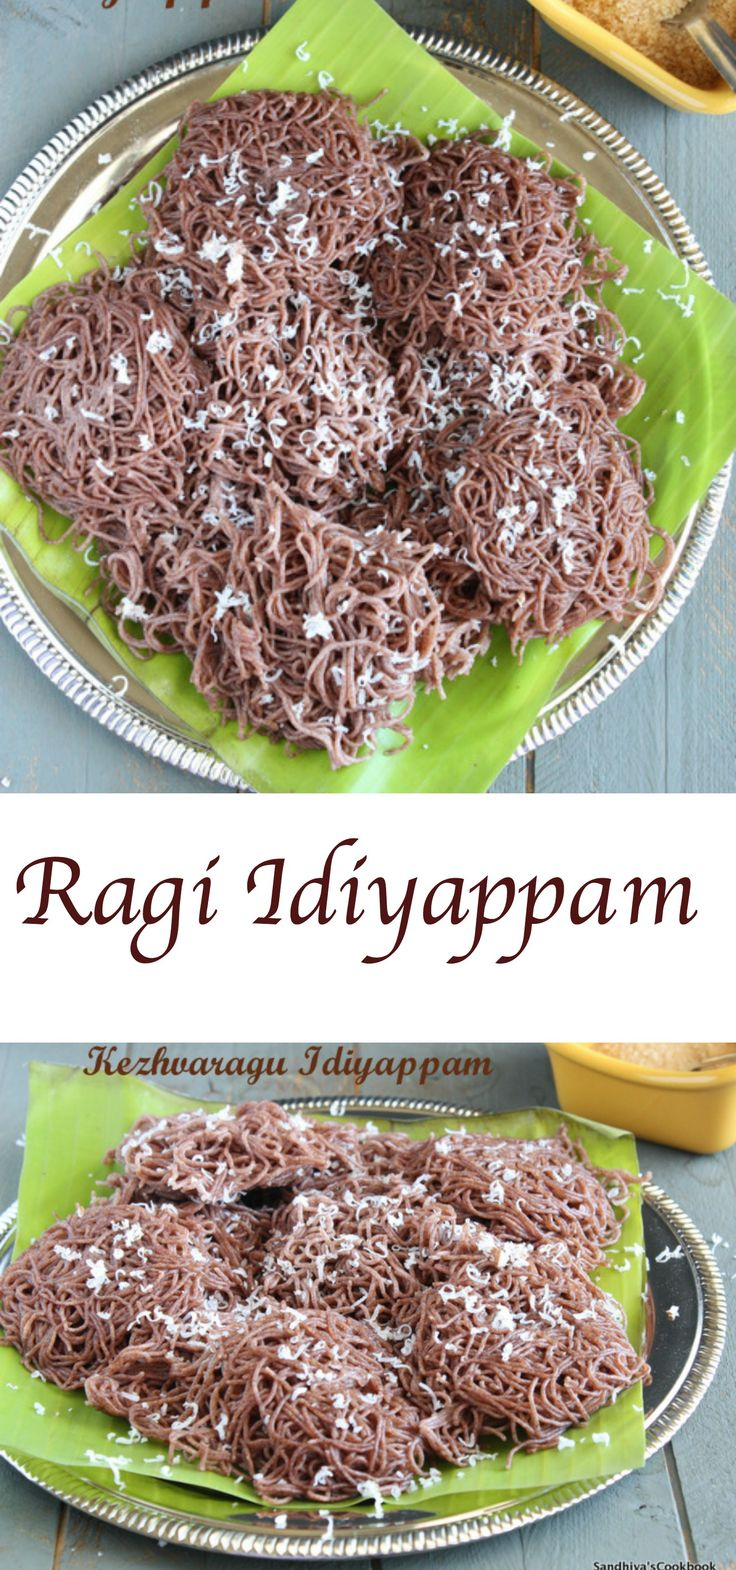 Ragi Idiyappam | Kezhvaragu Idiyappam | Finger Millet Idiyappam